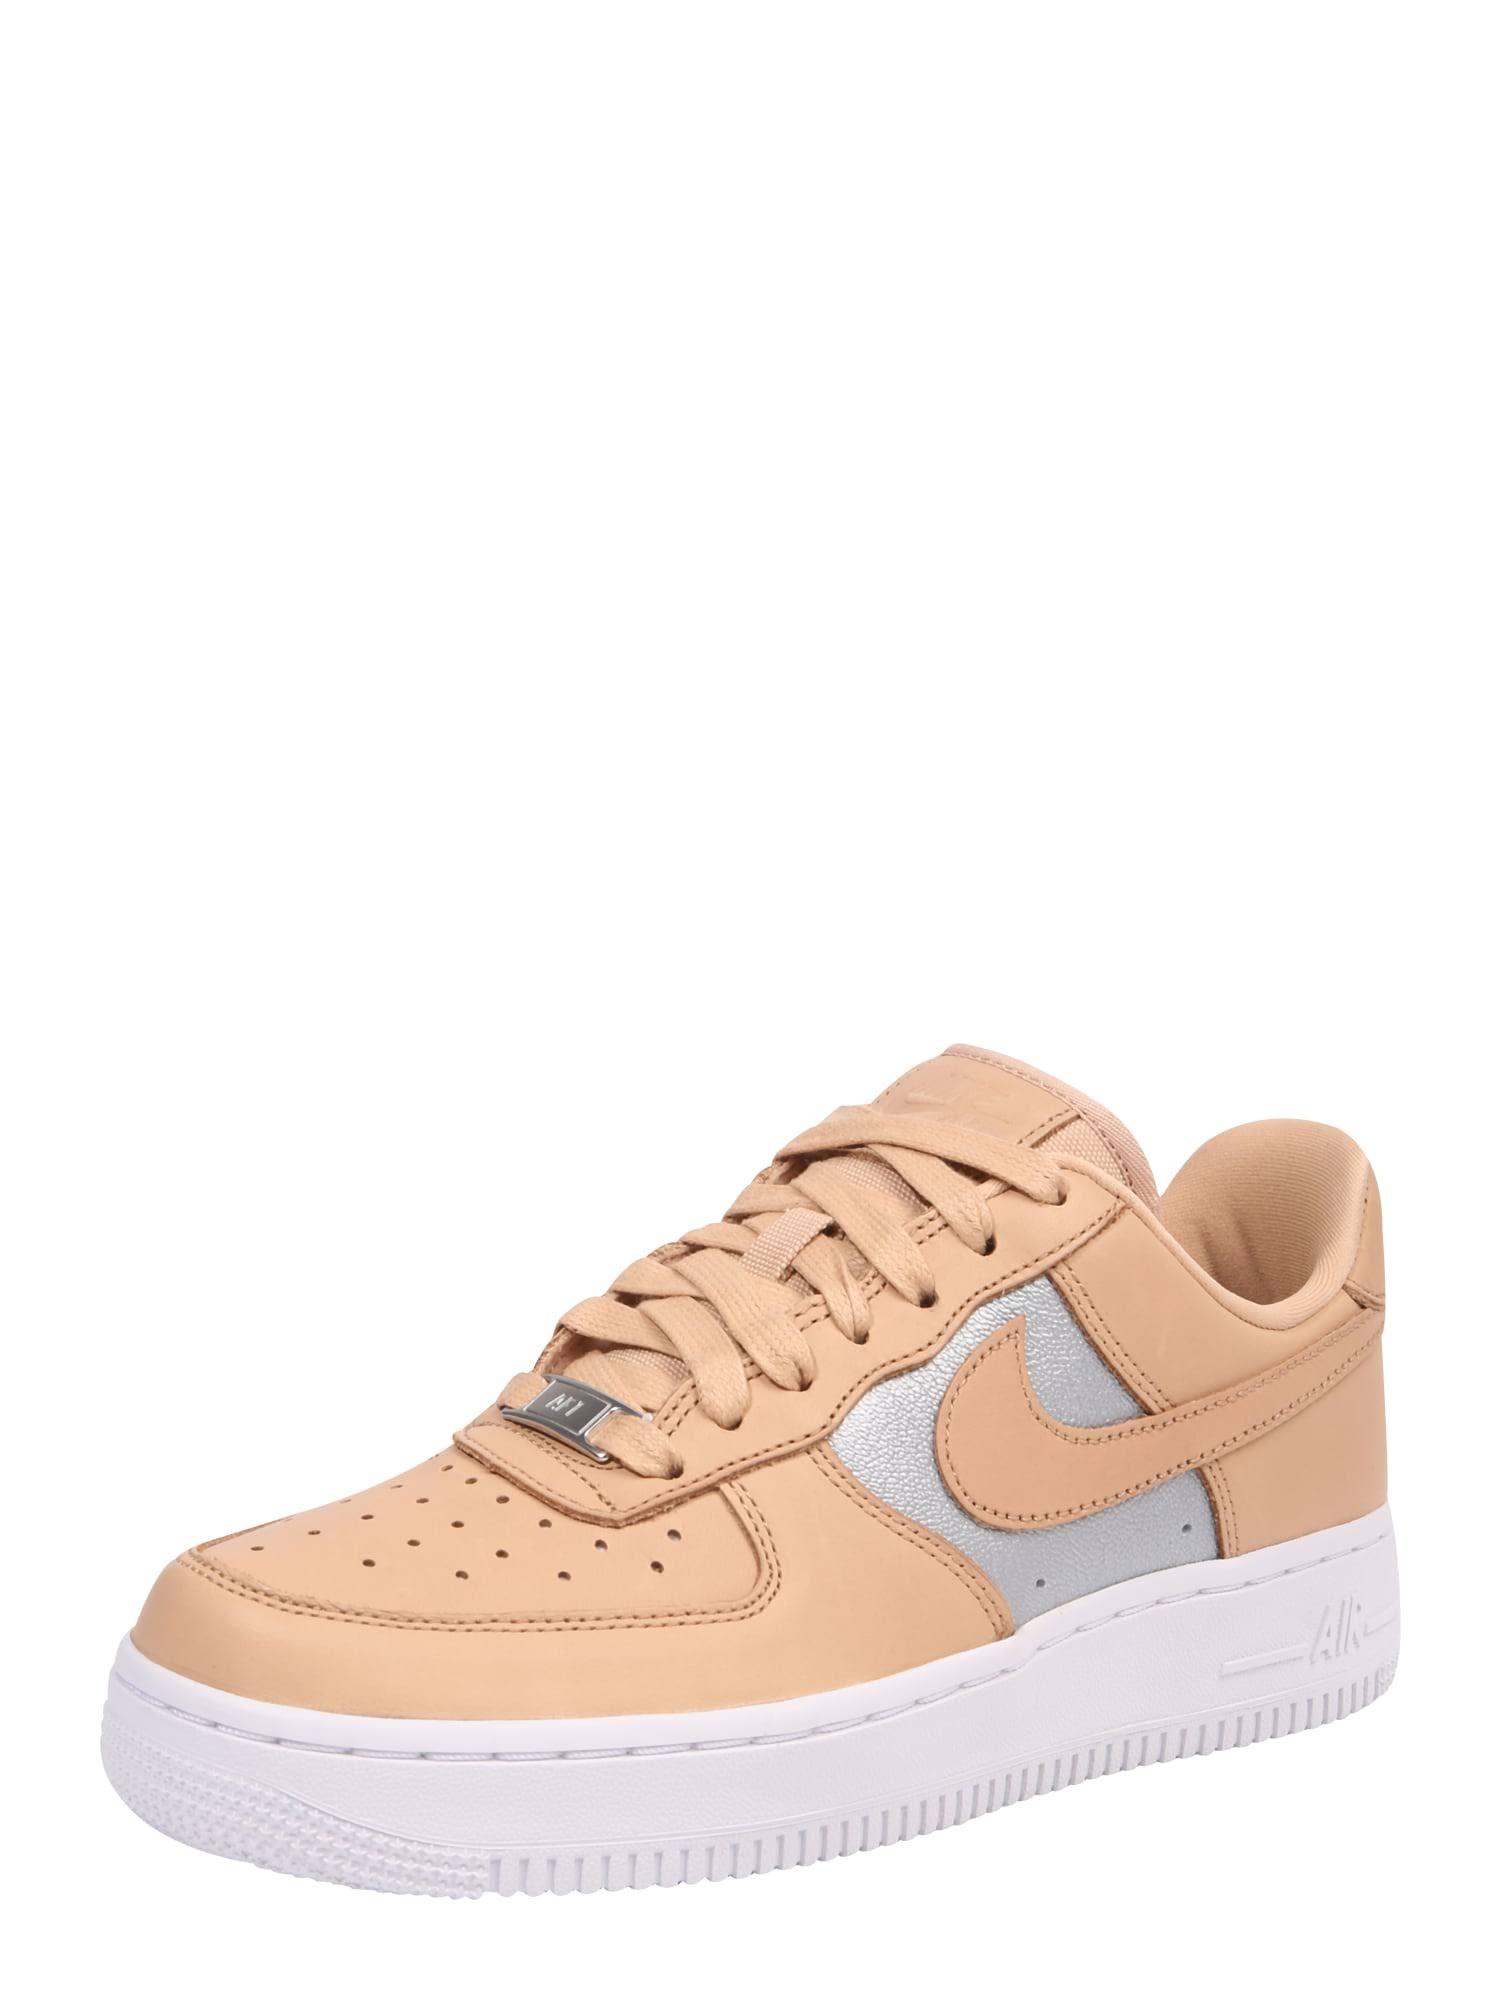 Schuhe Ah6827200 40 Nike Beige Air Größe silber W 07 Force Se Prm 1 UdBFqx